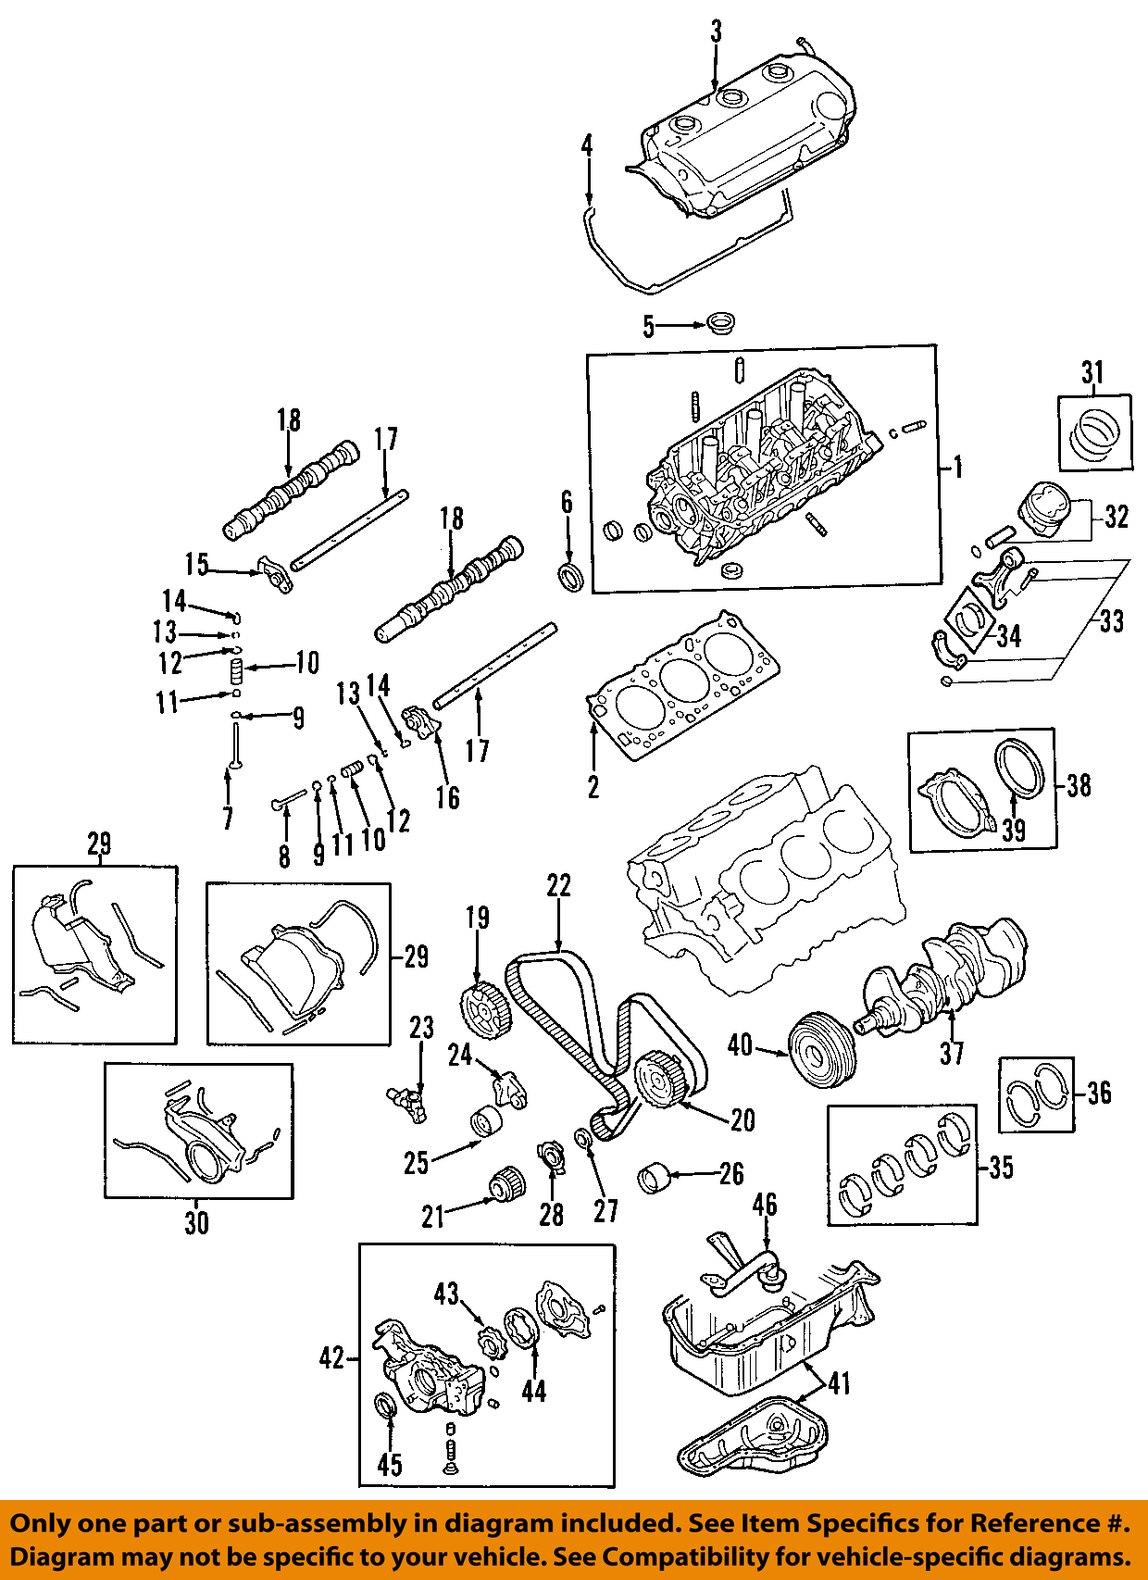 hight resolution of wiring drawling for 2003 3 0 mitsubishi engine online wiring diagram 2005 mitsubishi endeavor